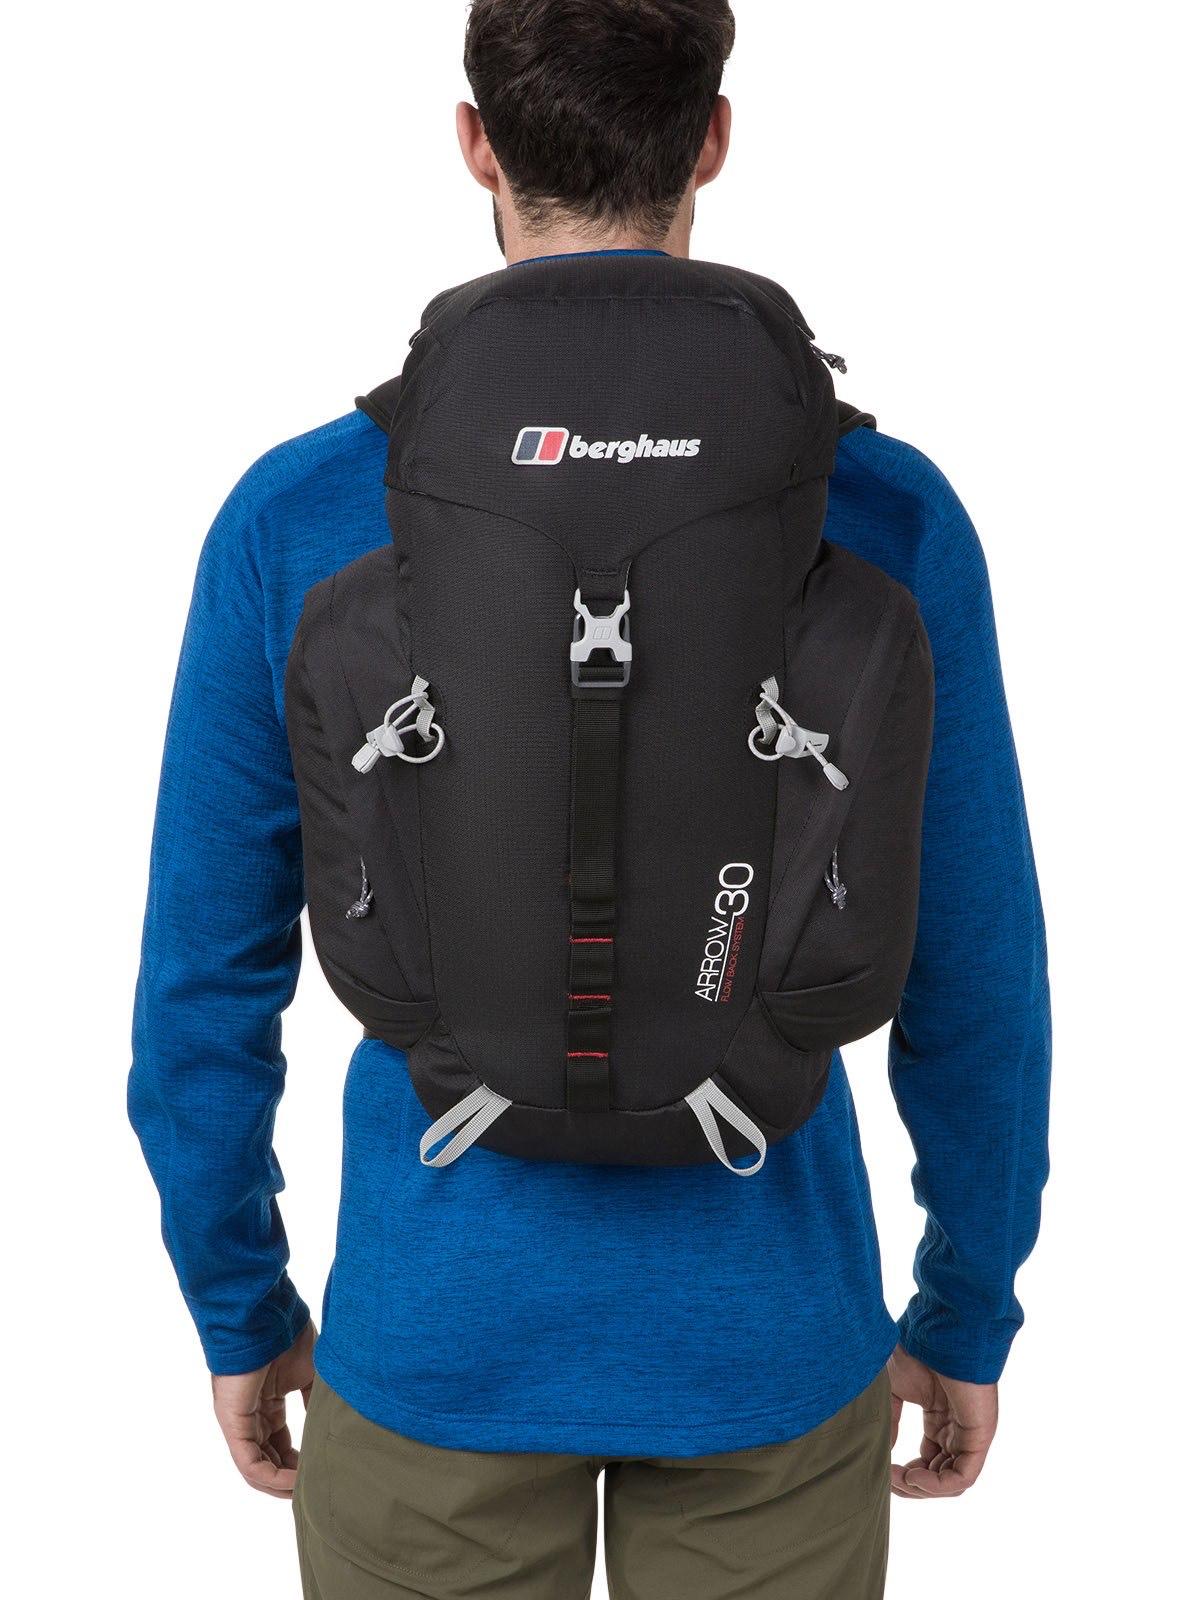 Berghaus Arrow 30 Rucksack £41 @ Amazon